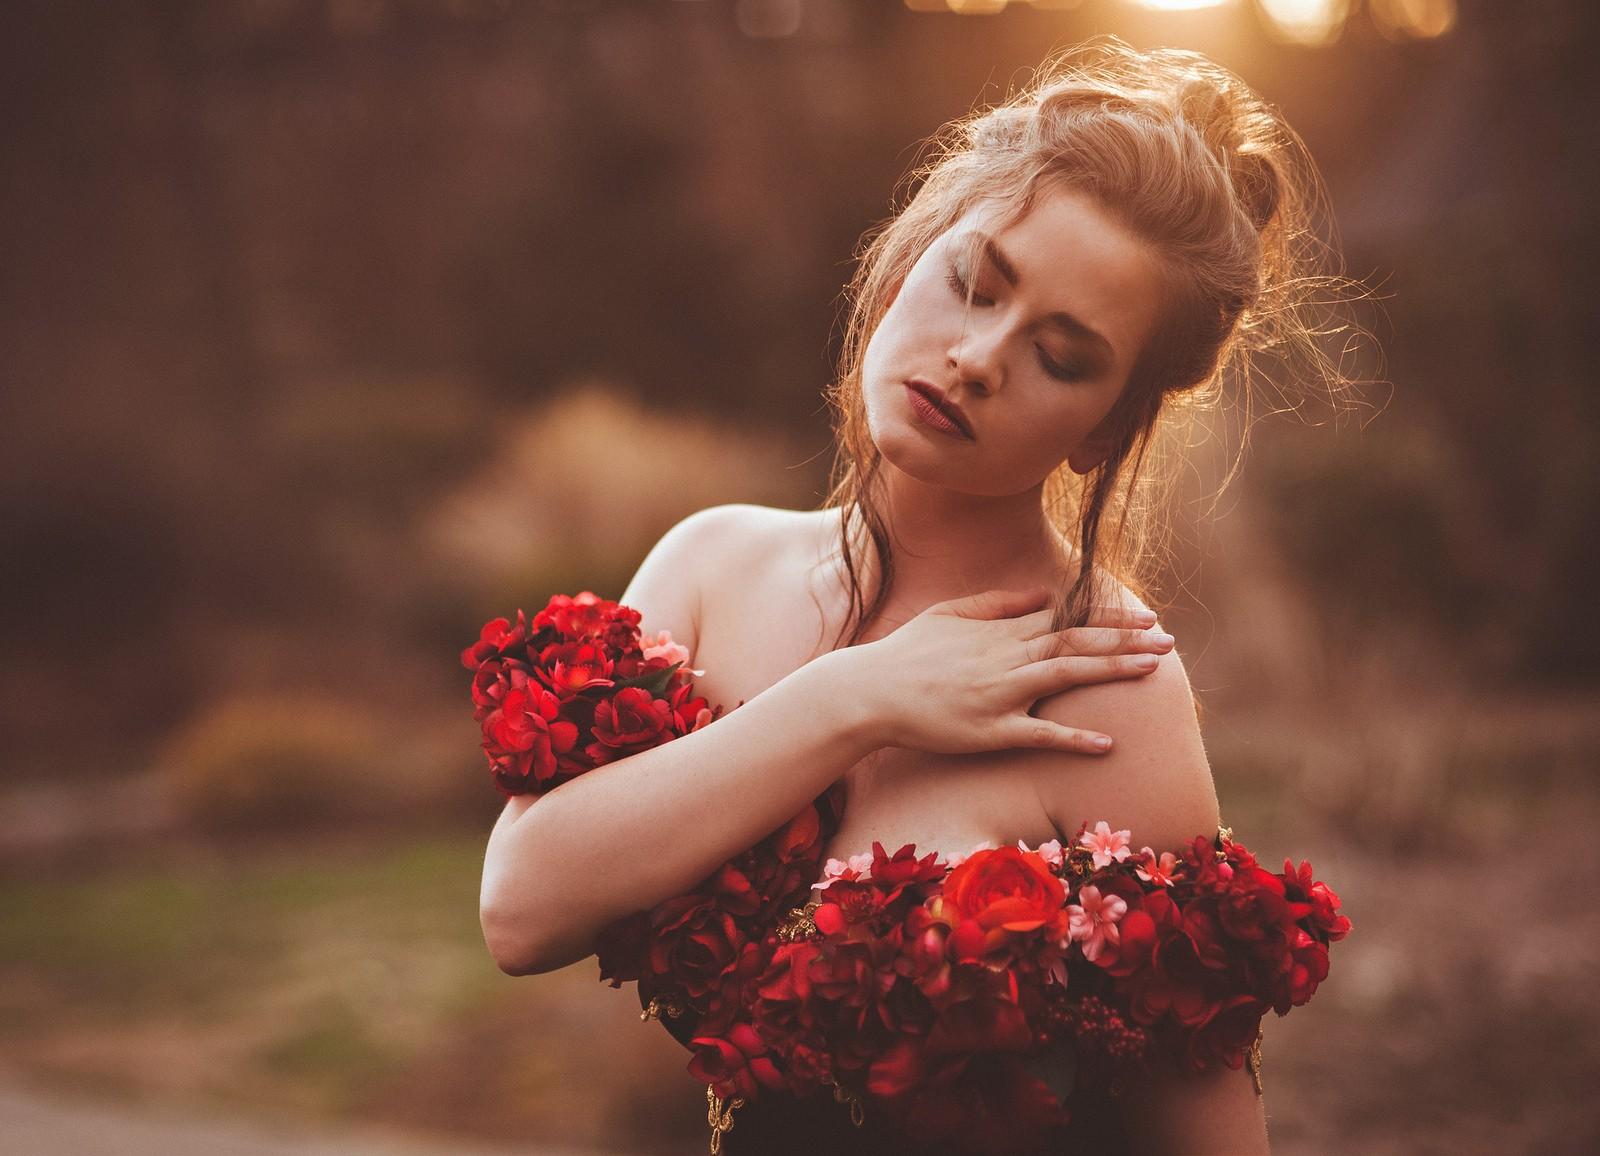 Девушки цветы картинки